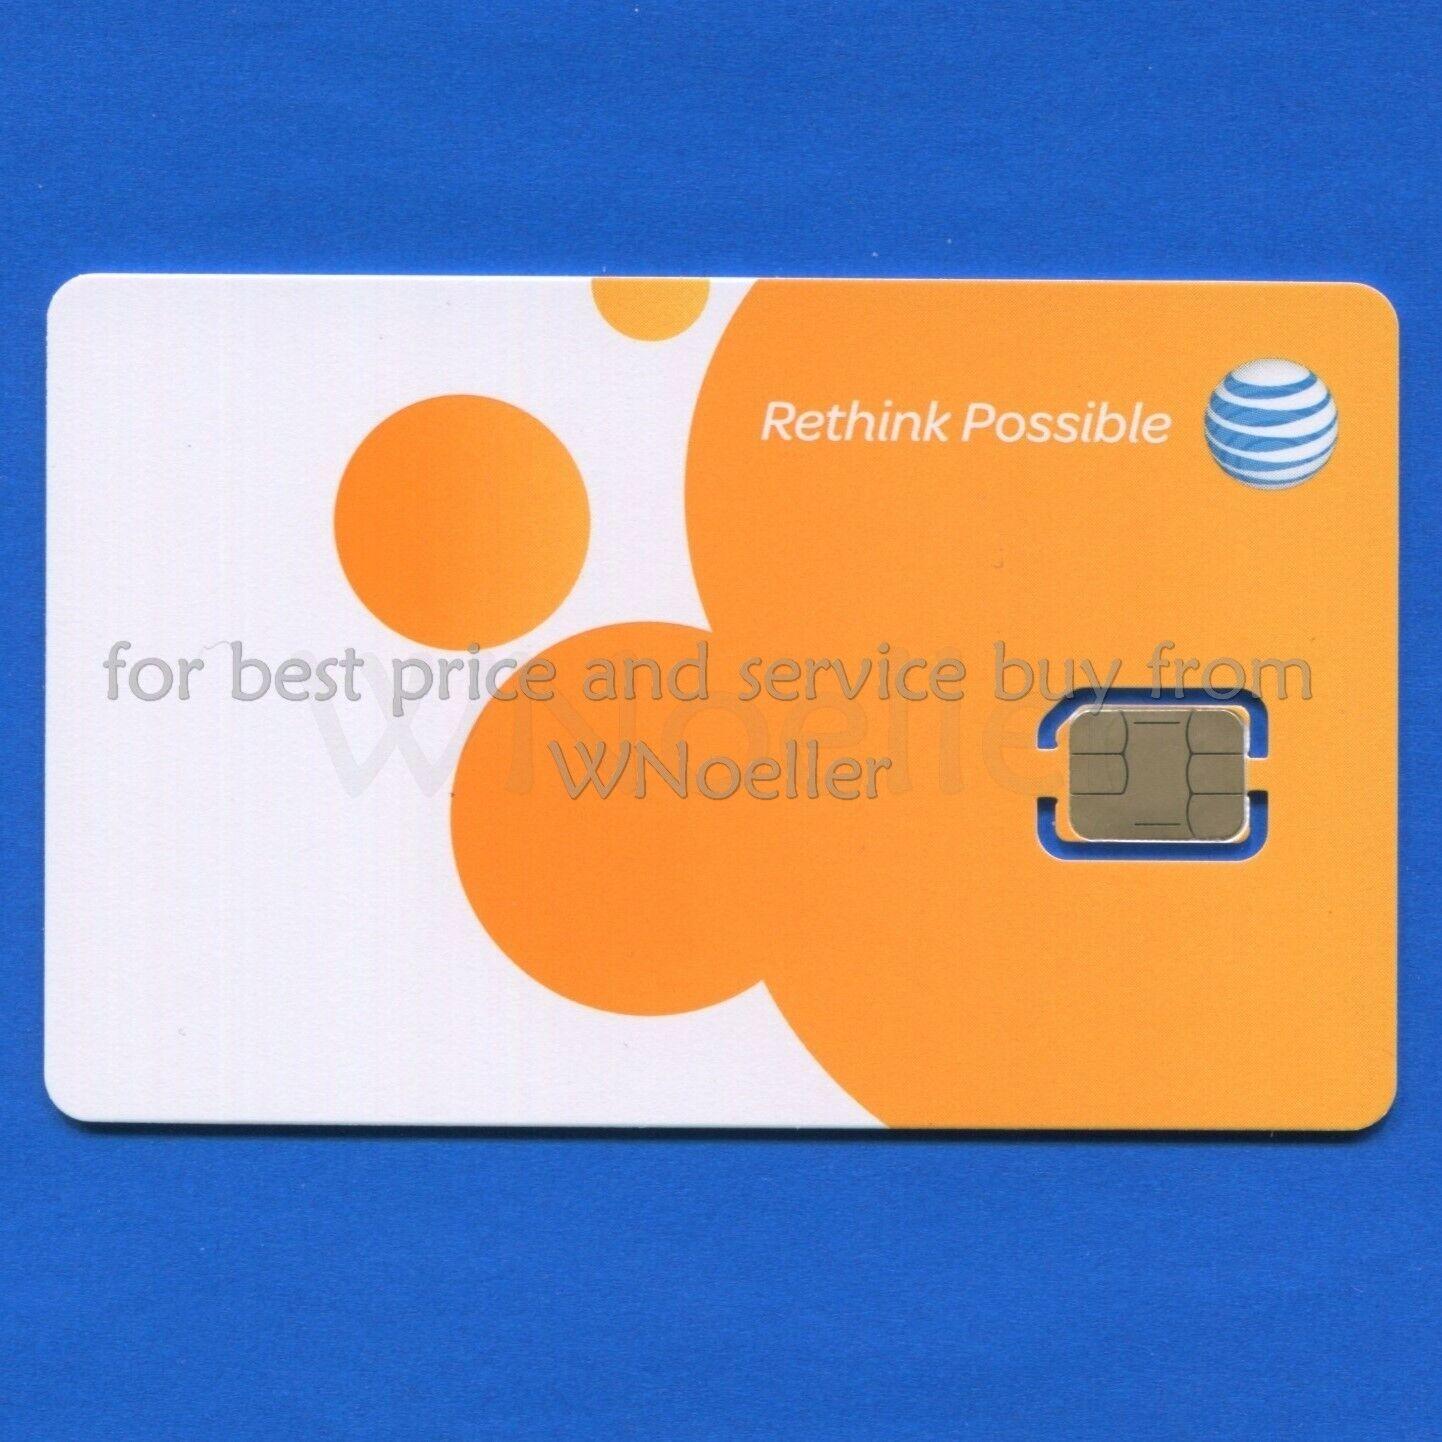 как выглядит SIM-карта для мобильного телефона NEW Genuine AT&T Nano Sim Card • supports 4G LTE • Prepaid GoPhone or Contract фото